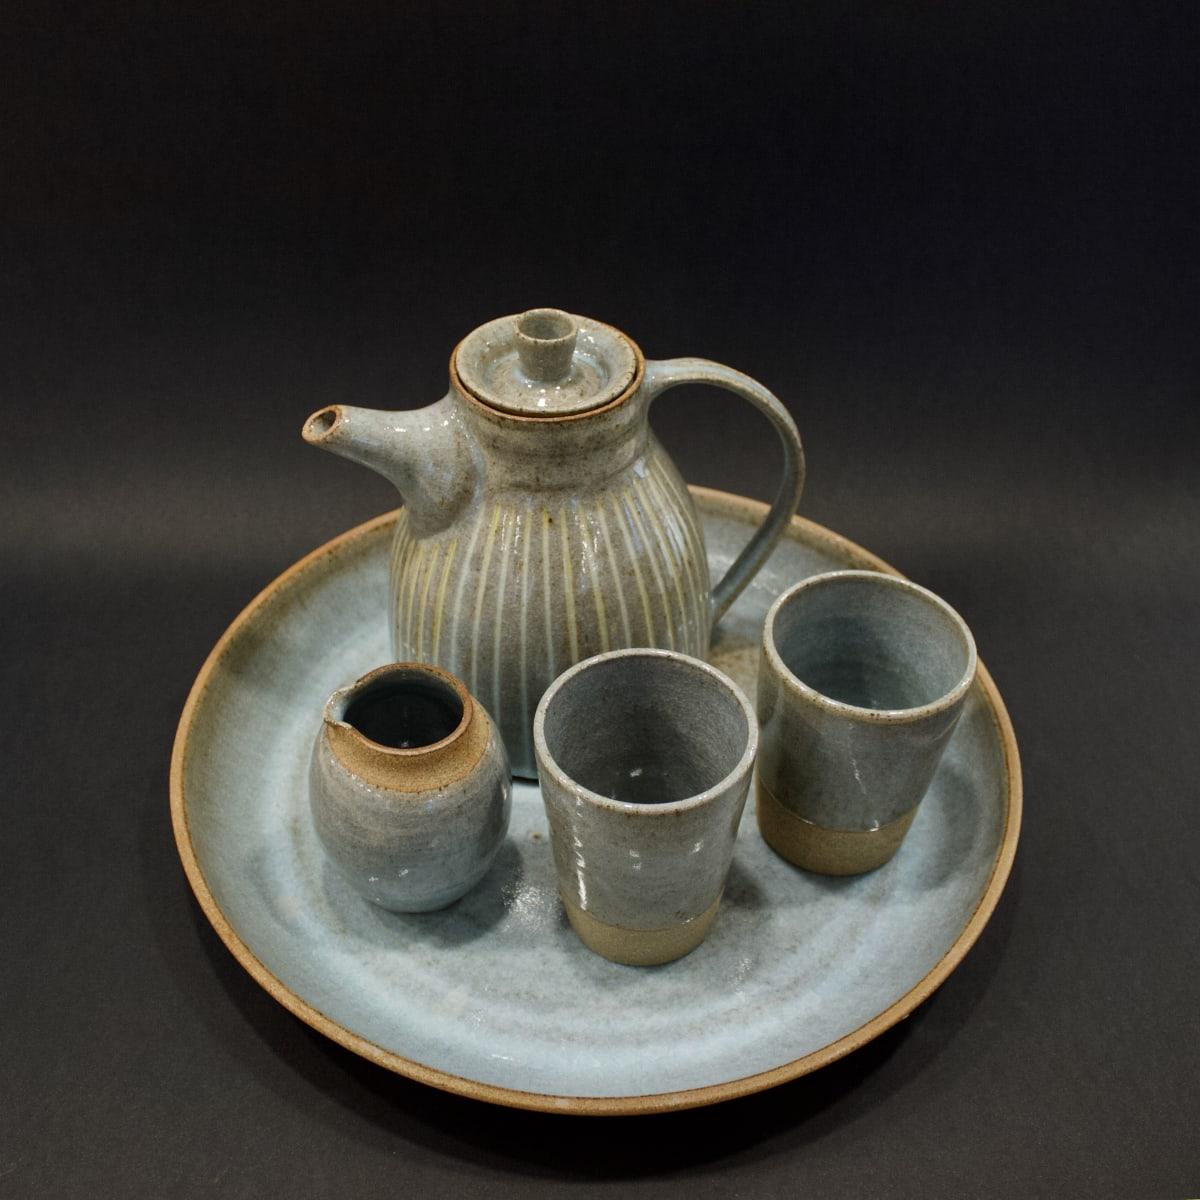 Kate Garwood Teaset, 2019 Ceramic 18 x 32 x 32 cm 7 1/8 x 12 5/8 x 12 5/8 in